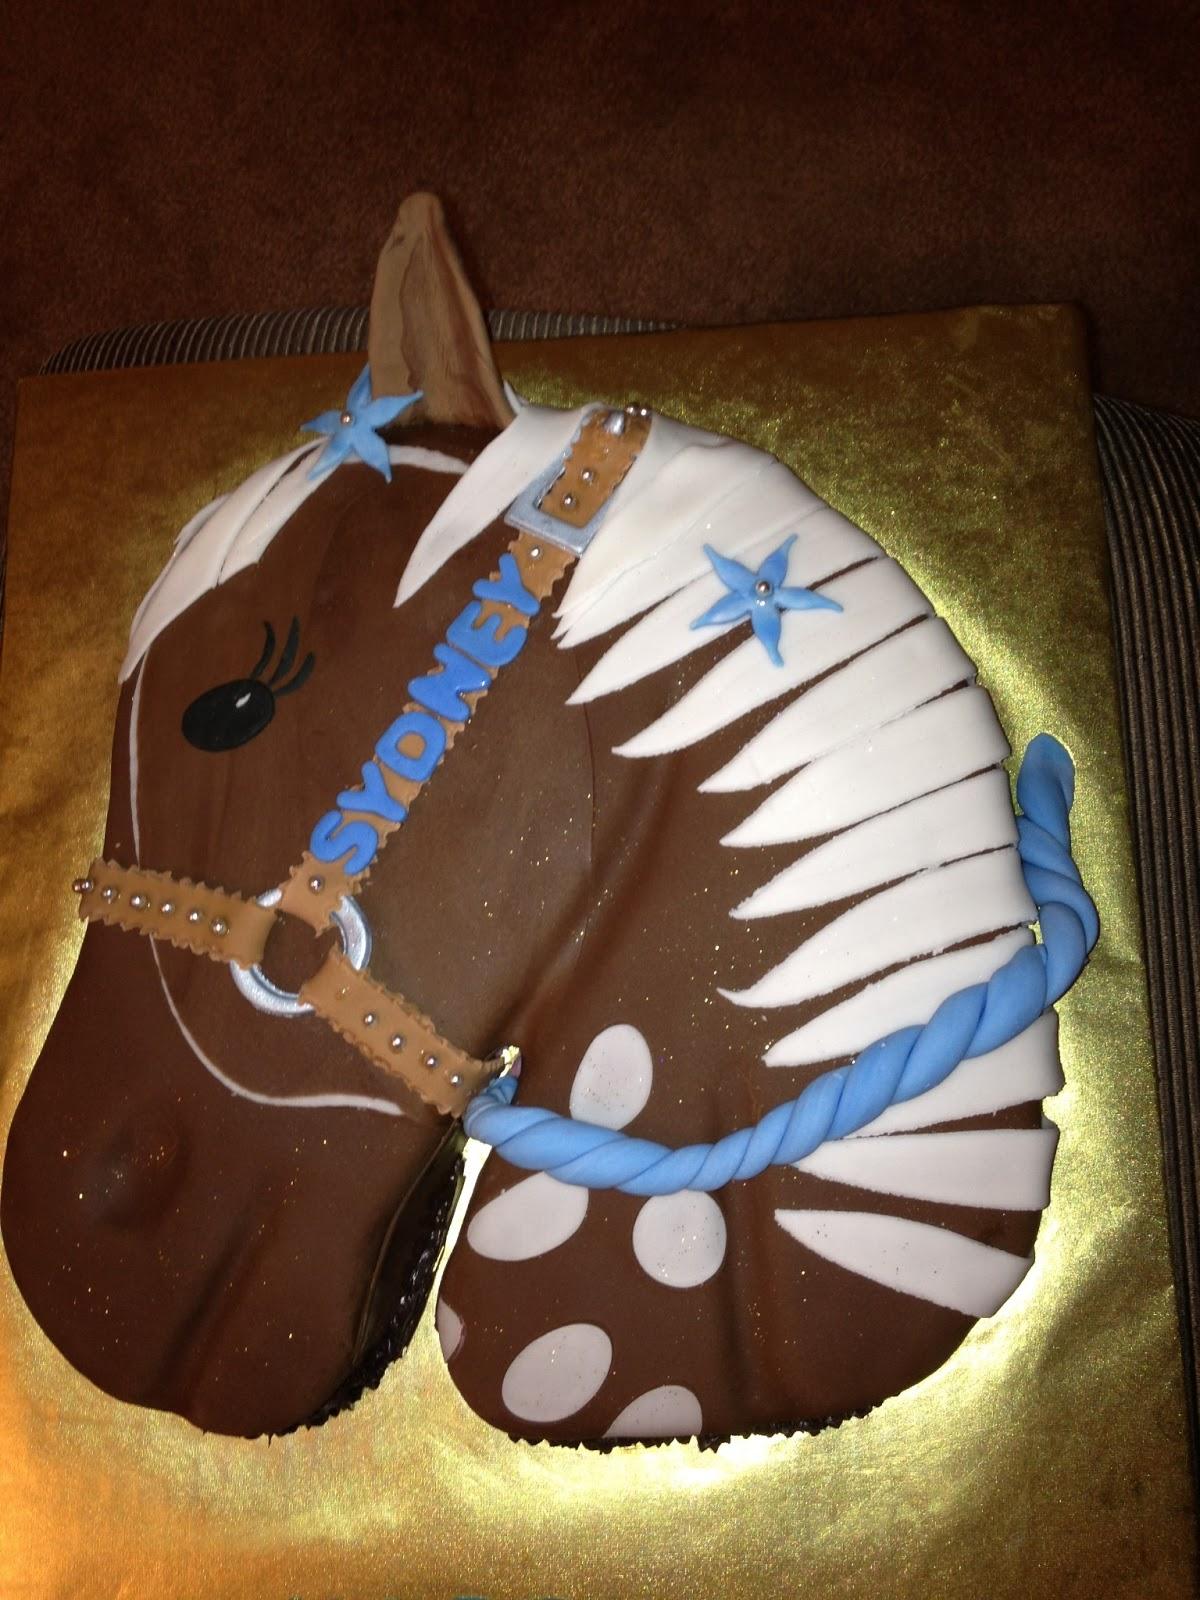 Horse Head Cake Design : LA s Cakes: Horse head cake